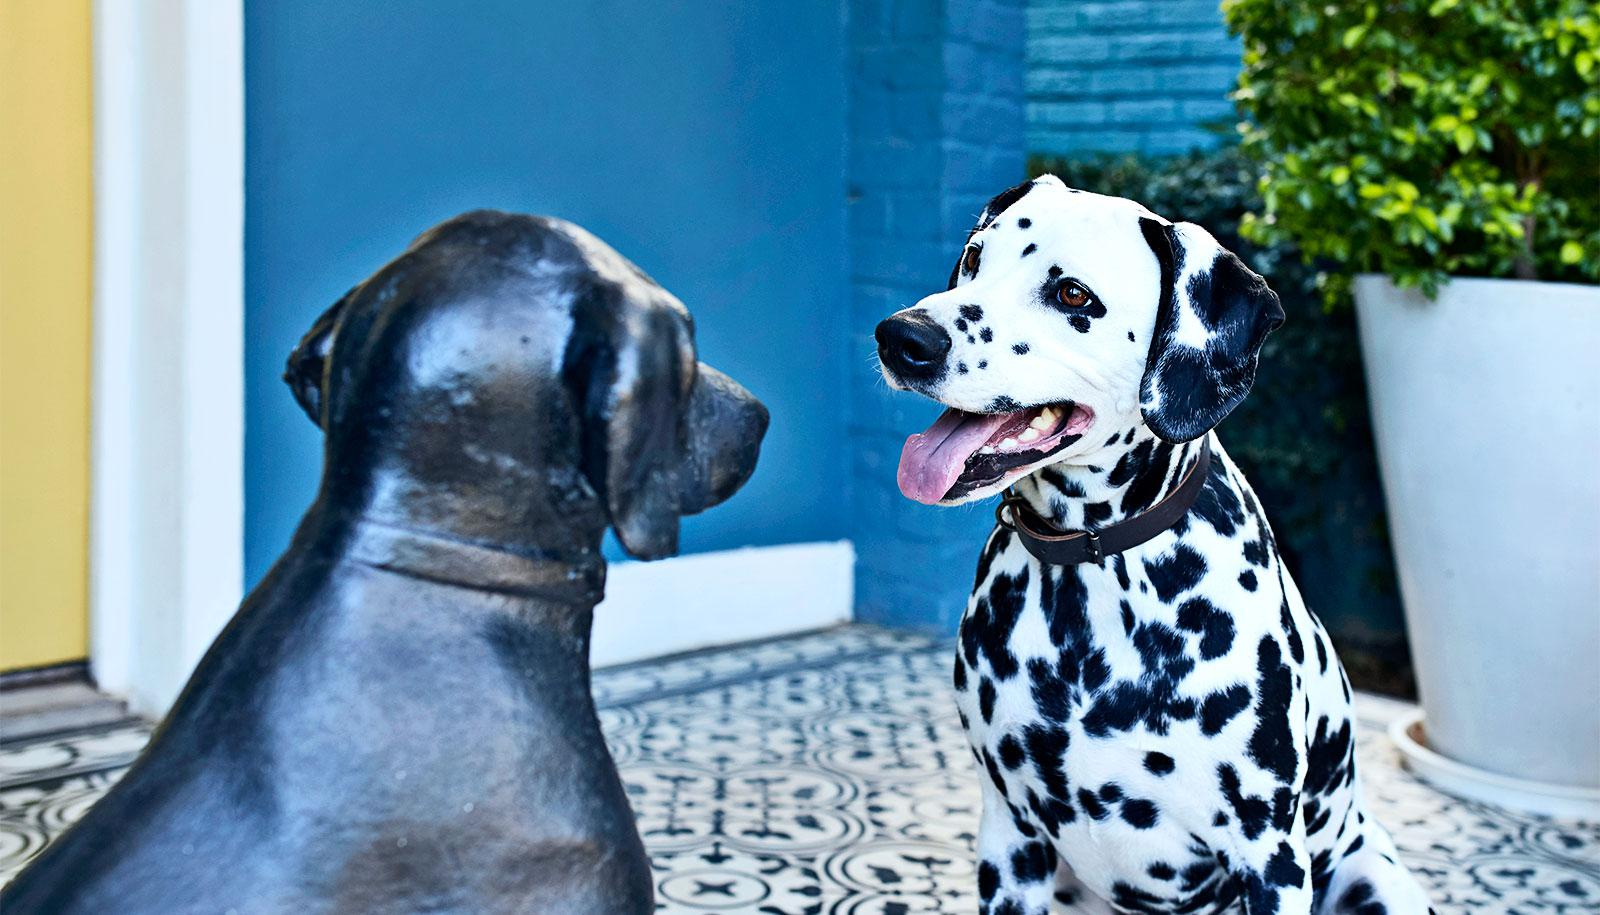 dalmatian statue reflection (dog personality concept)